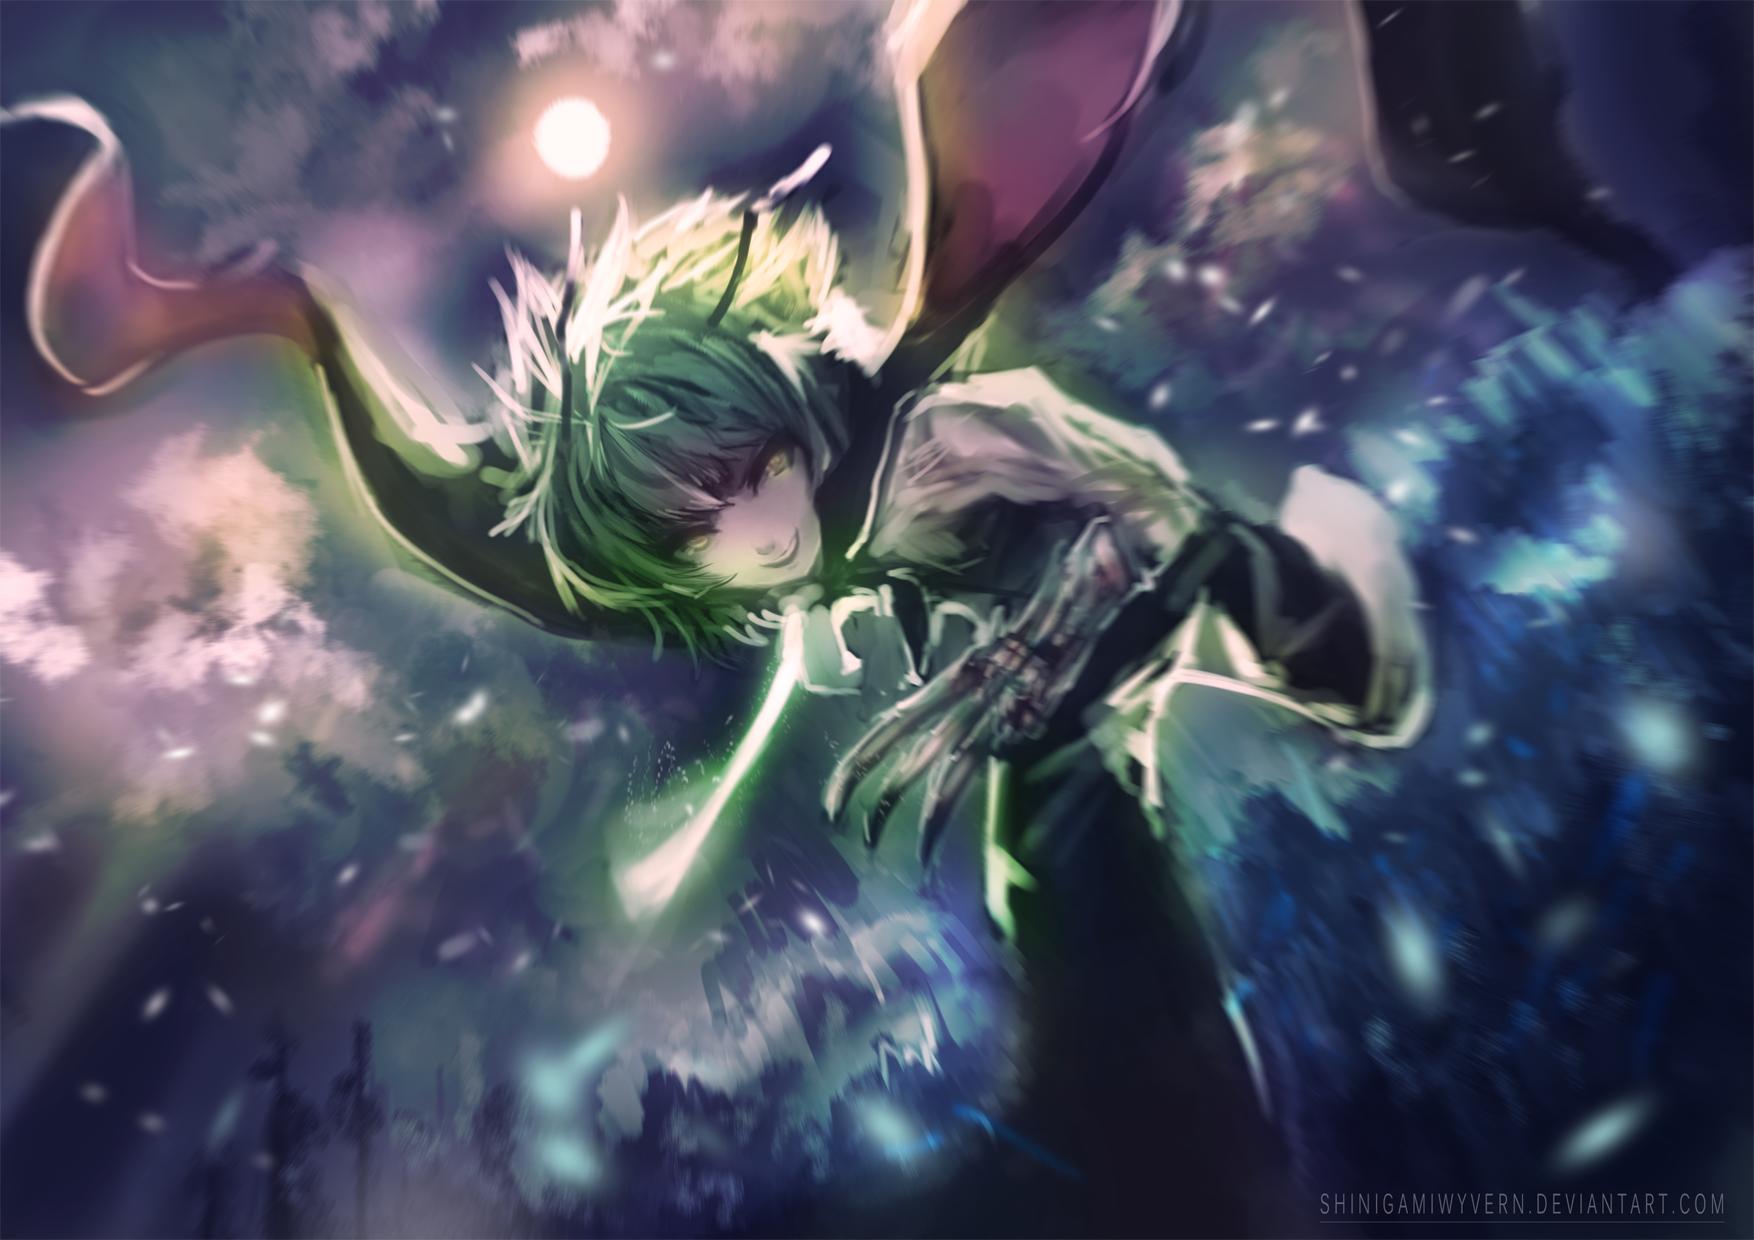 LIGHTSABER UNF by Shinigamiwyvern